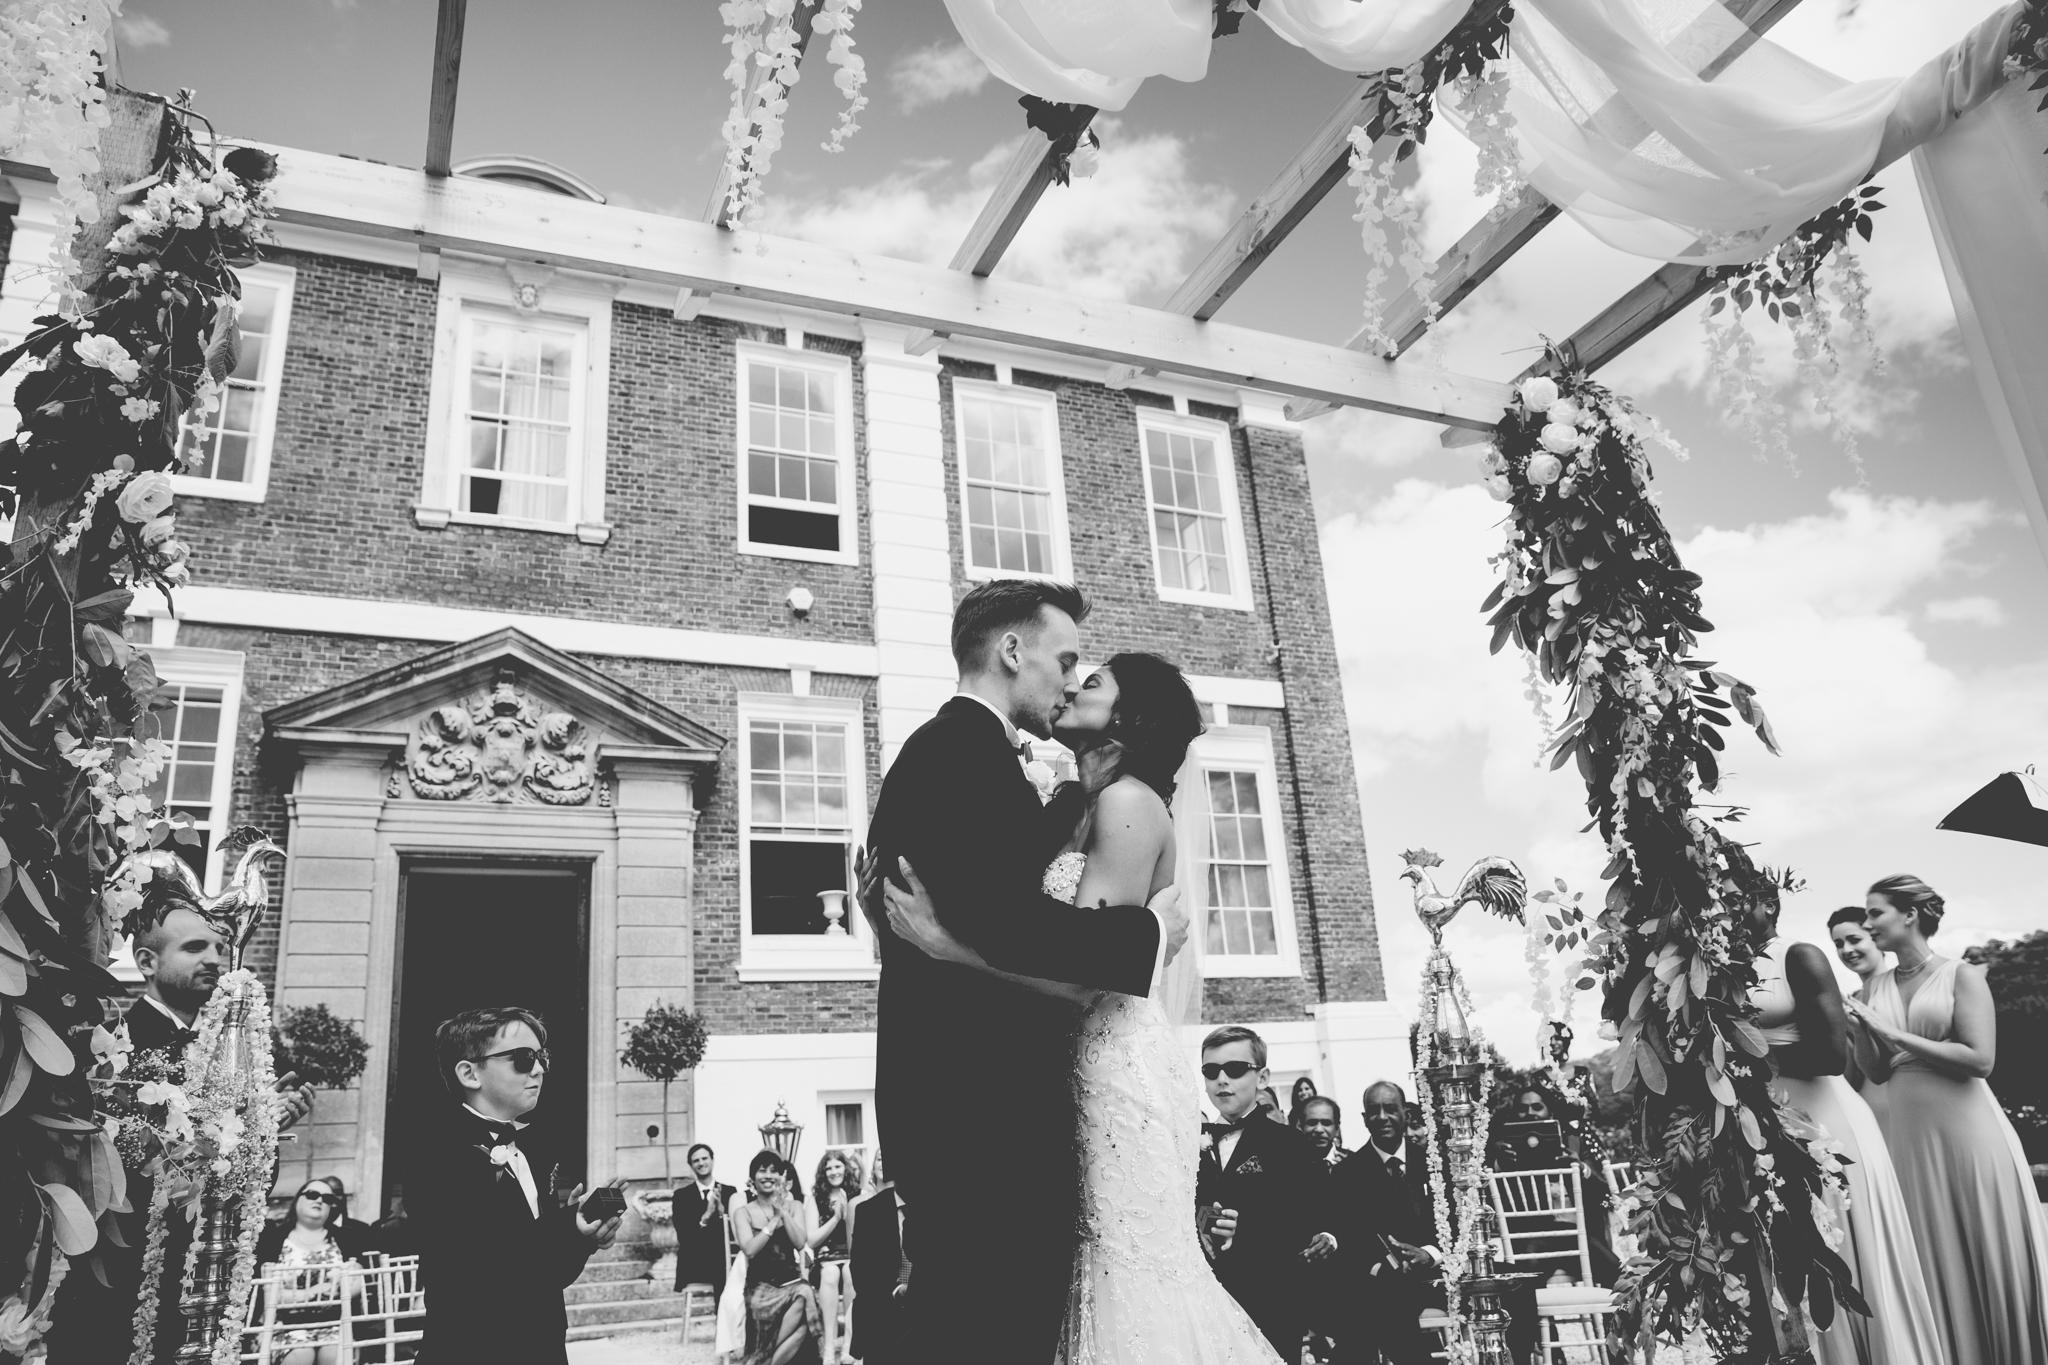 Amy Sampson   Creative Documentary Wedding Photographer   Ishani and Iain's Devon Wedding at Pyne's House, Exeter, Devon